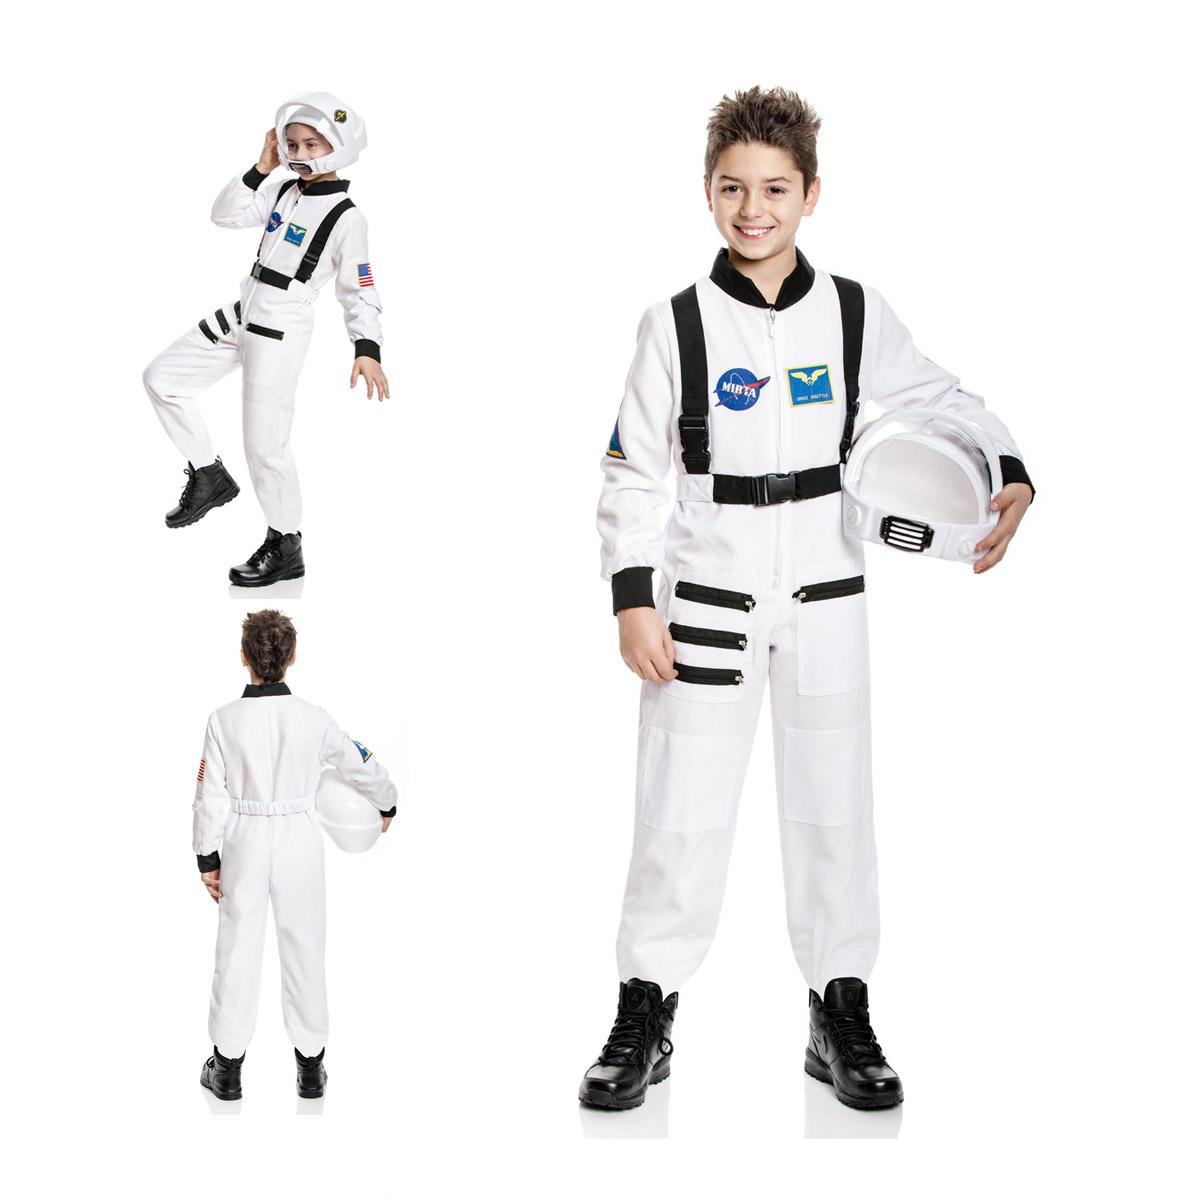 astronautenkost m kinder weltall space verkleidung. Black Bedroom Furniture Sets. Home Design Ideas